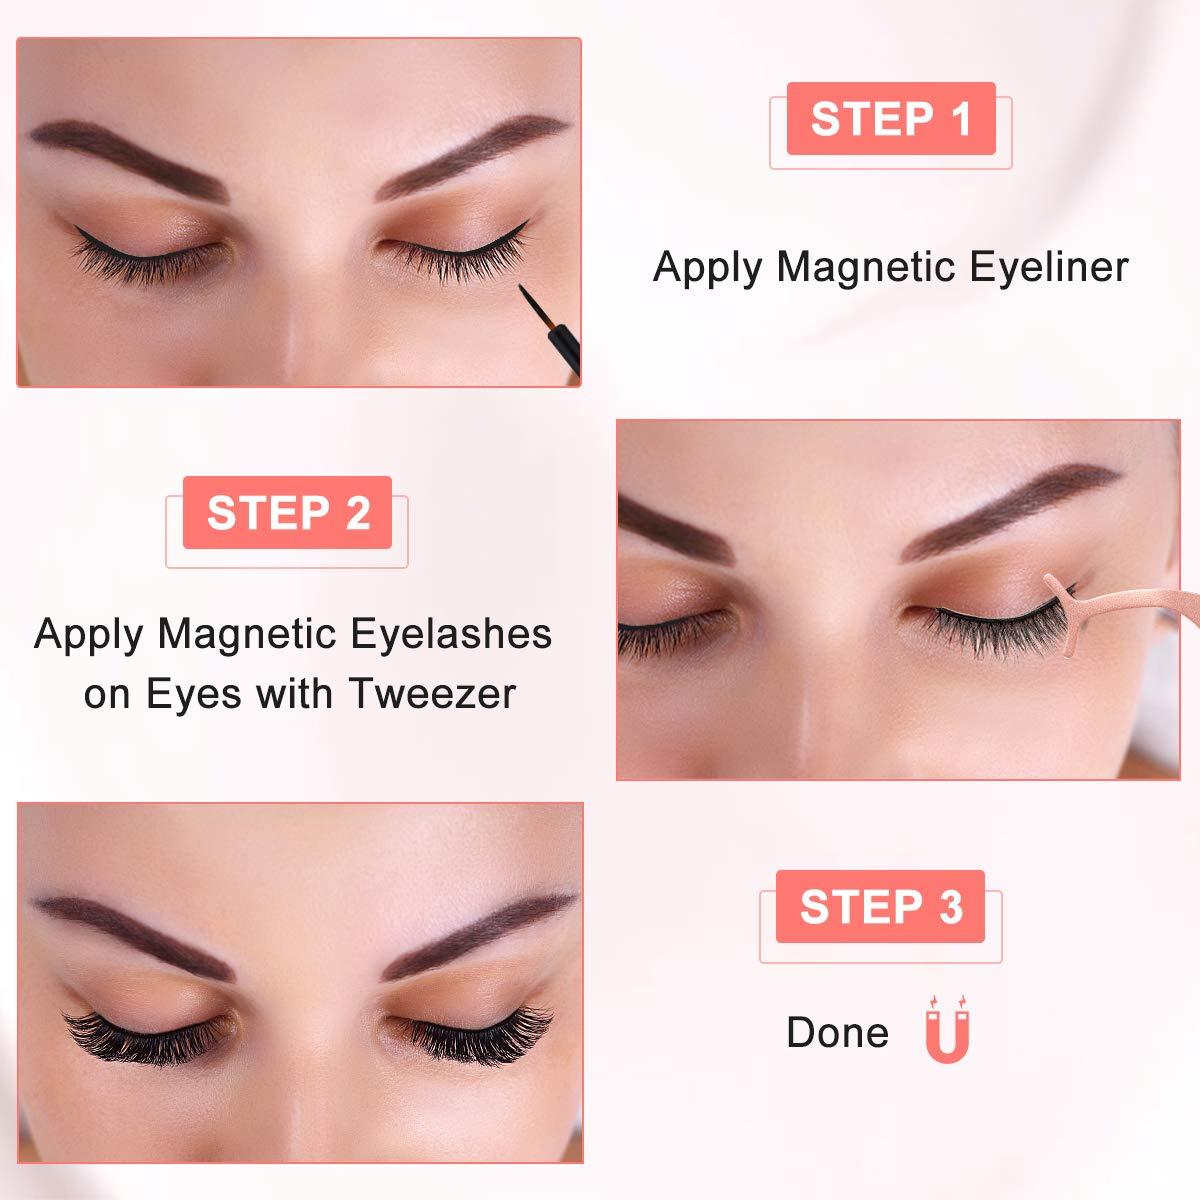 Magnetische Wimpern Eyeliner Kit, 6 Paar Natürlich Wasserdicht Falsche Magnetische Wimpern, 3D Wiederverwendbar Magnetischer Eyeliner 10Ml, Leder-Geschenkbox (Roségold)